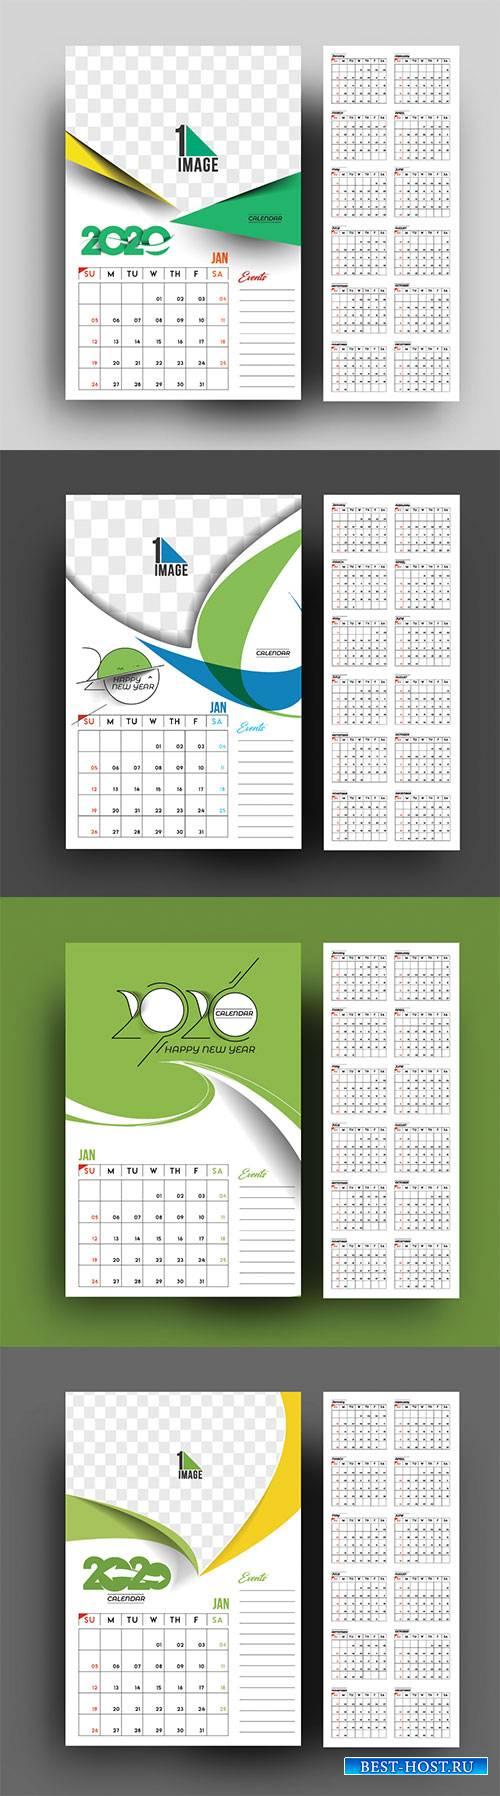 Happy new year 2020 Calendar # 4